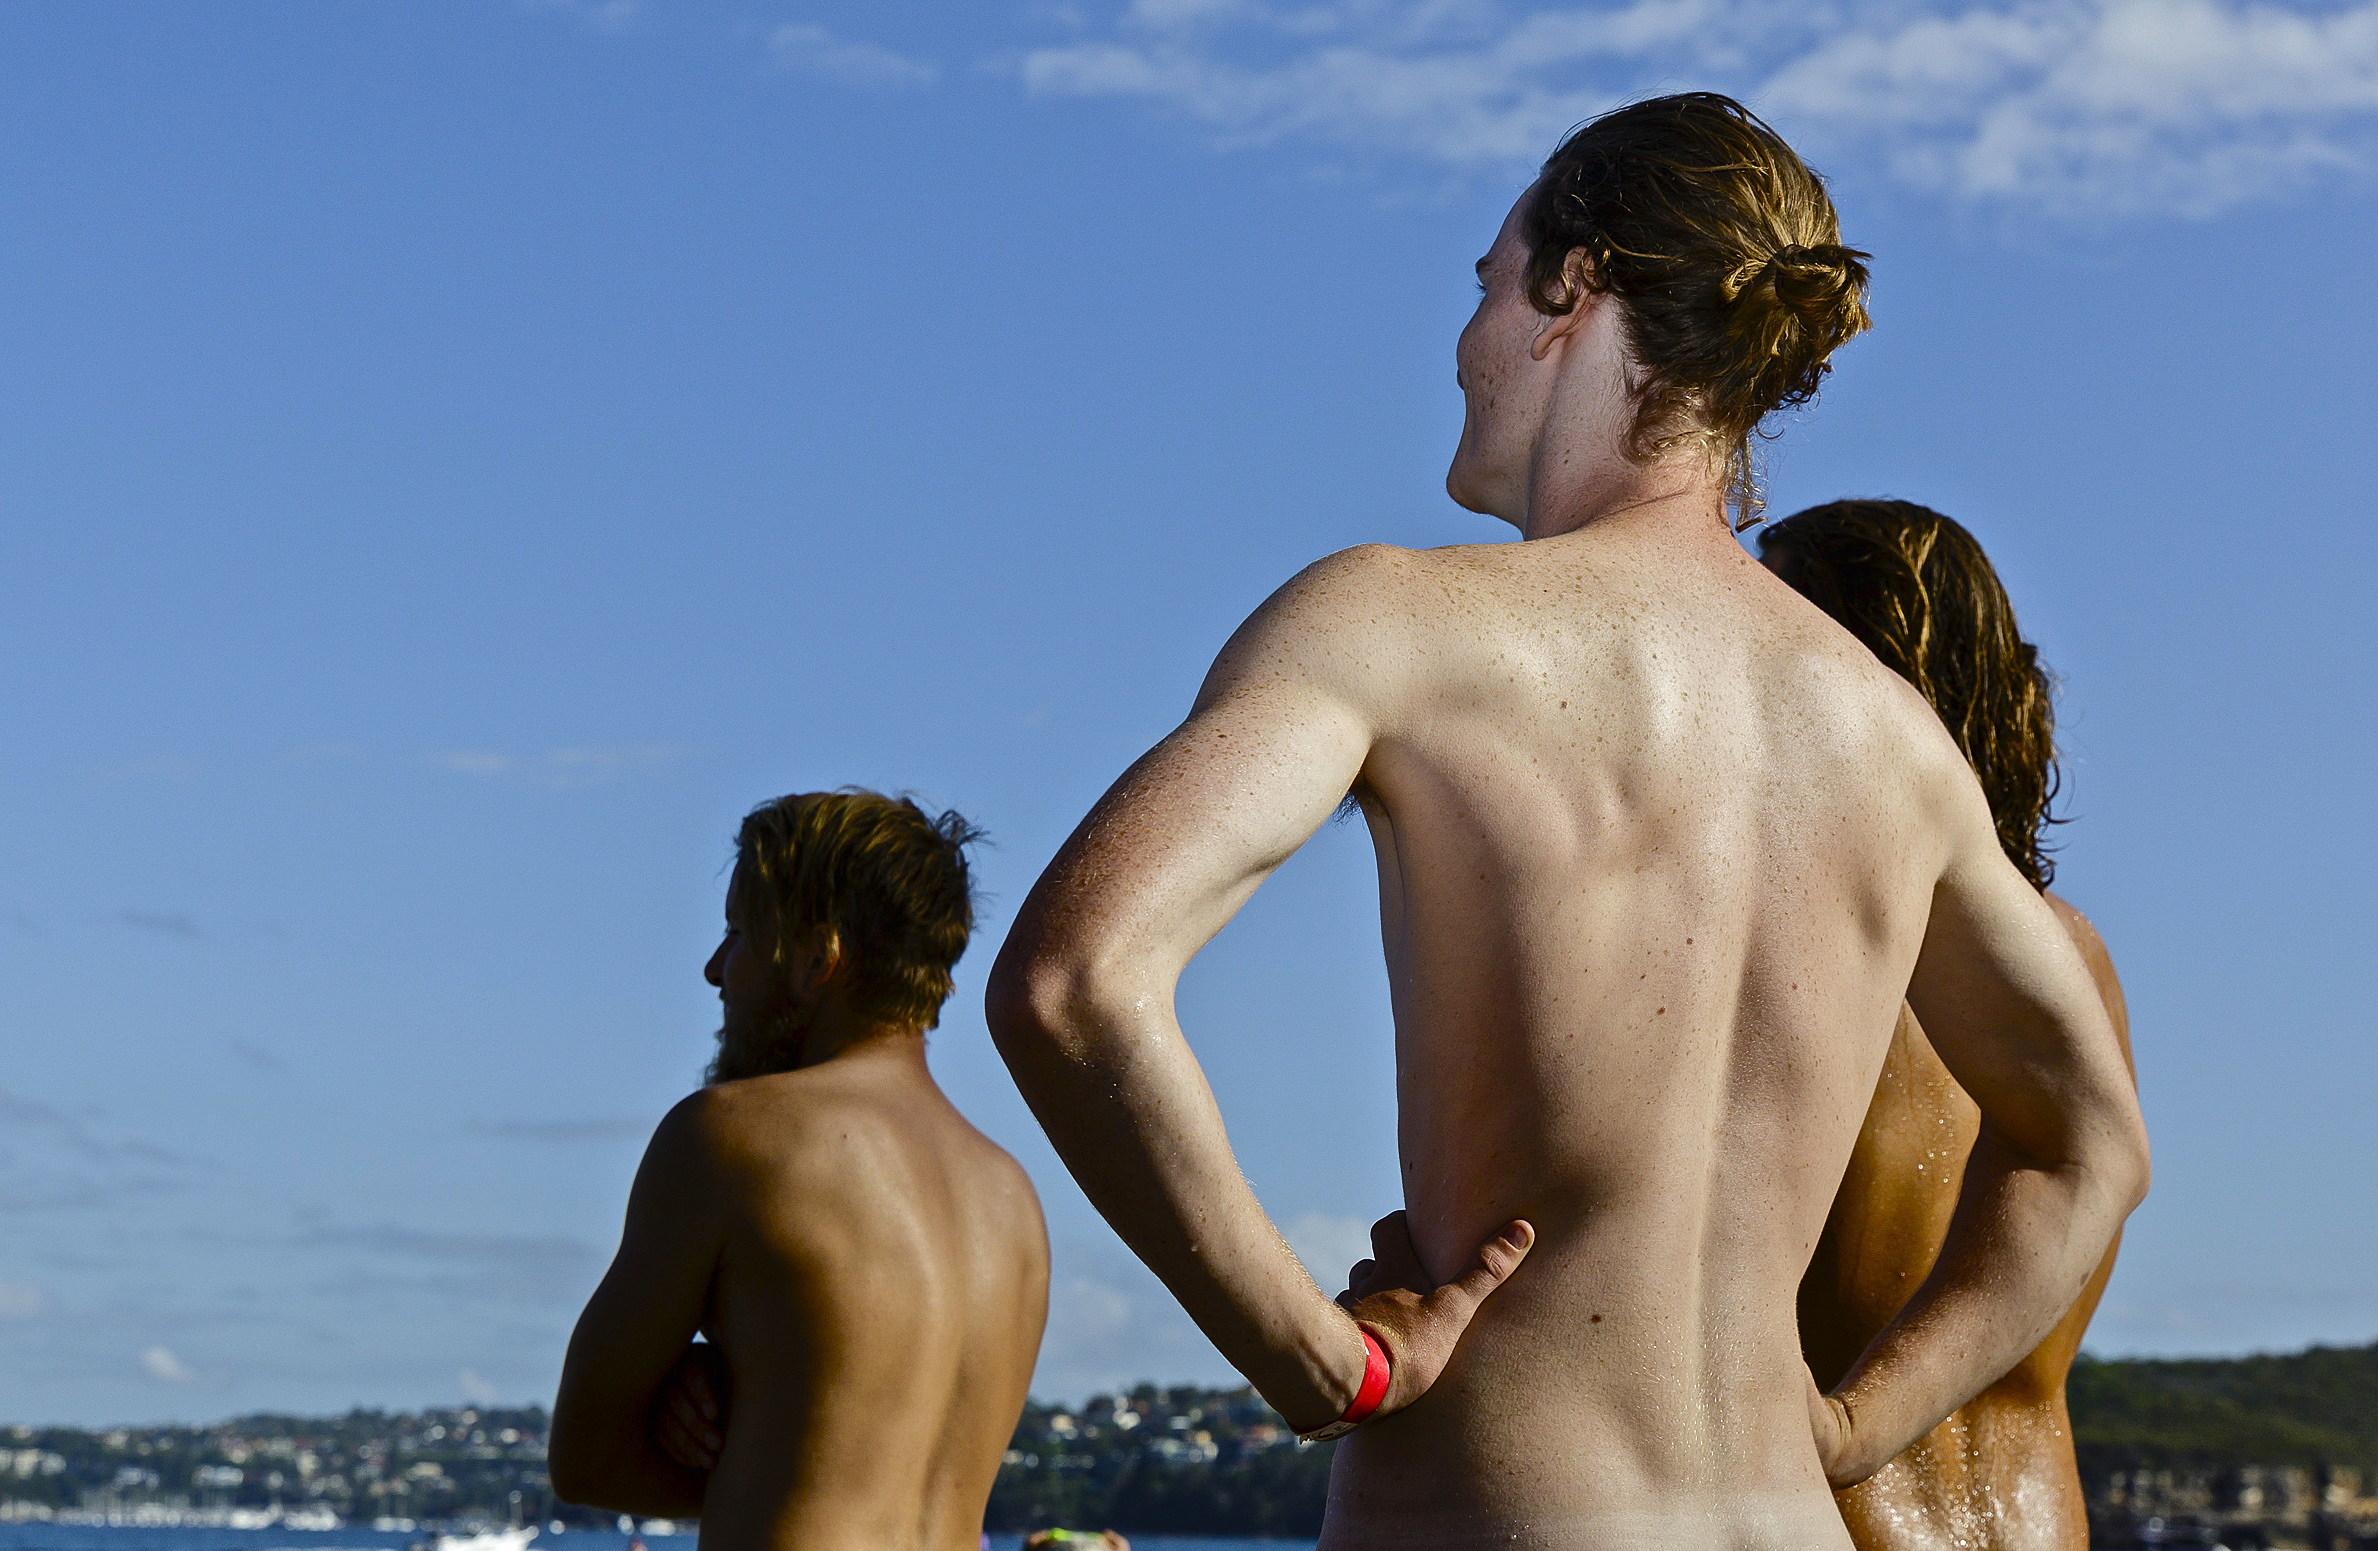 places nudist america north in